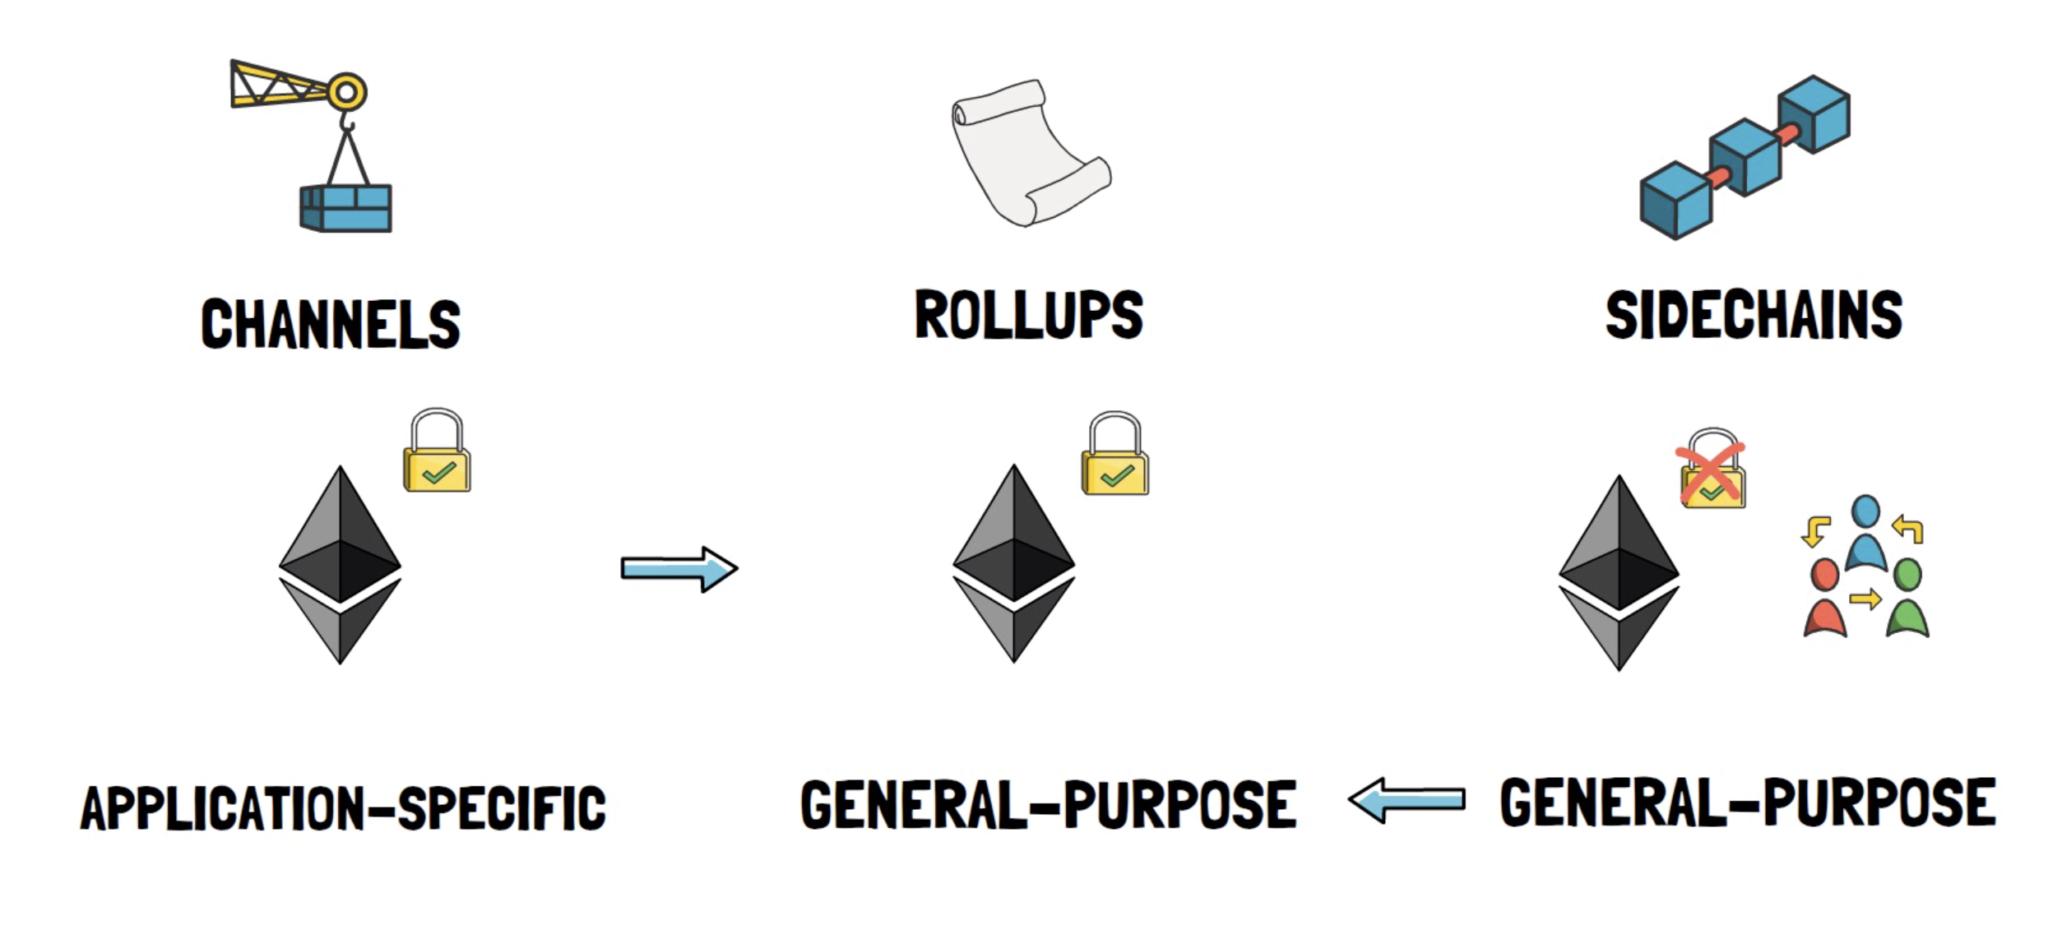 DeFi之道   一文了解以太坊的终极扩容方案——rollups